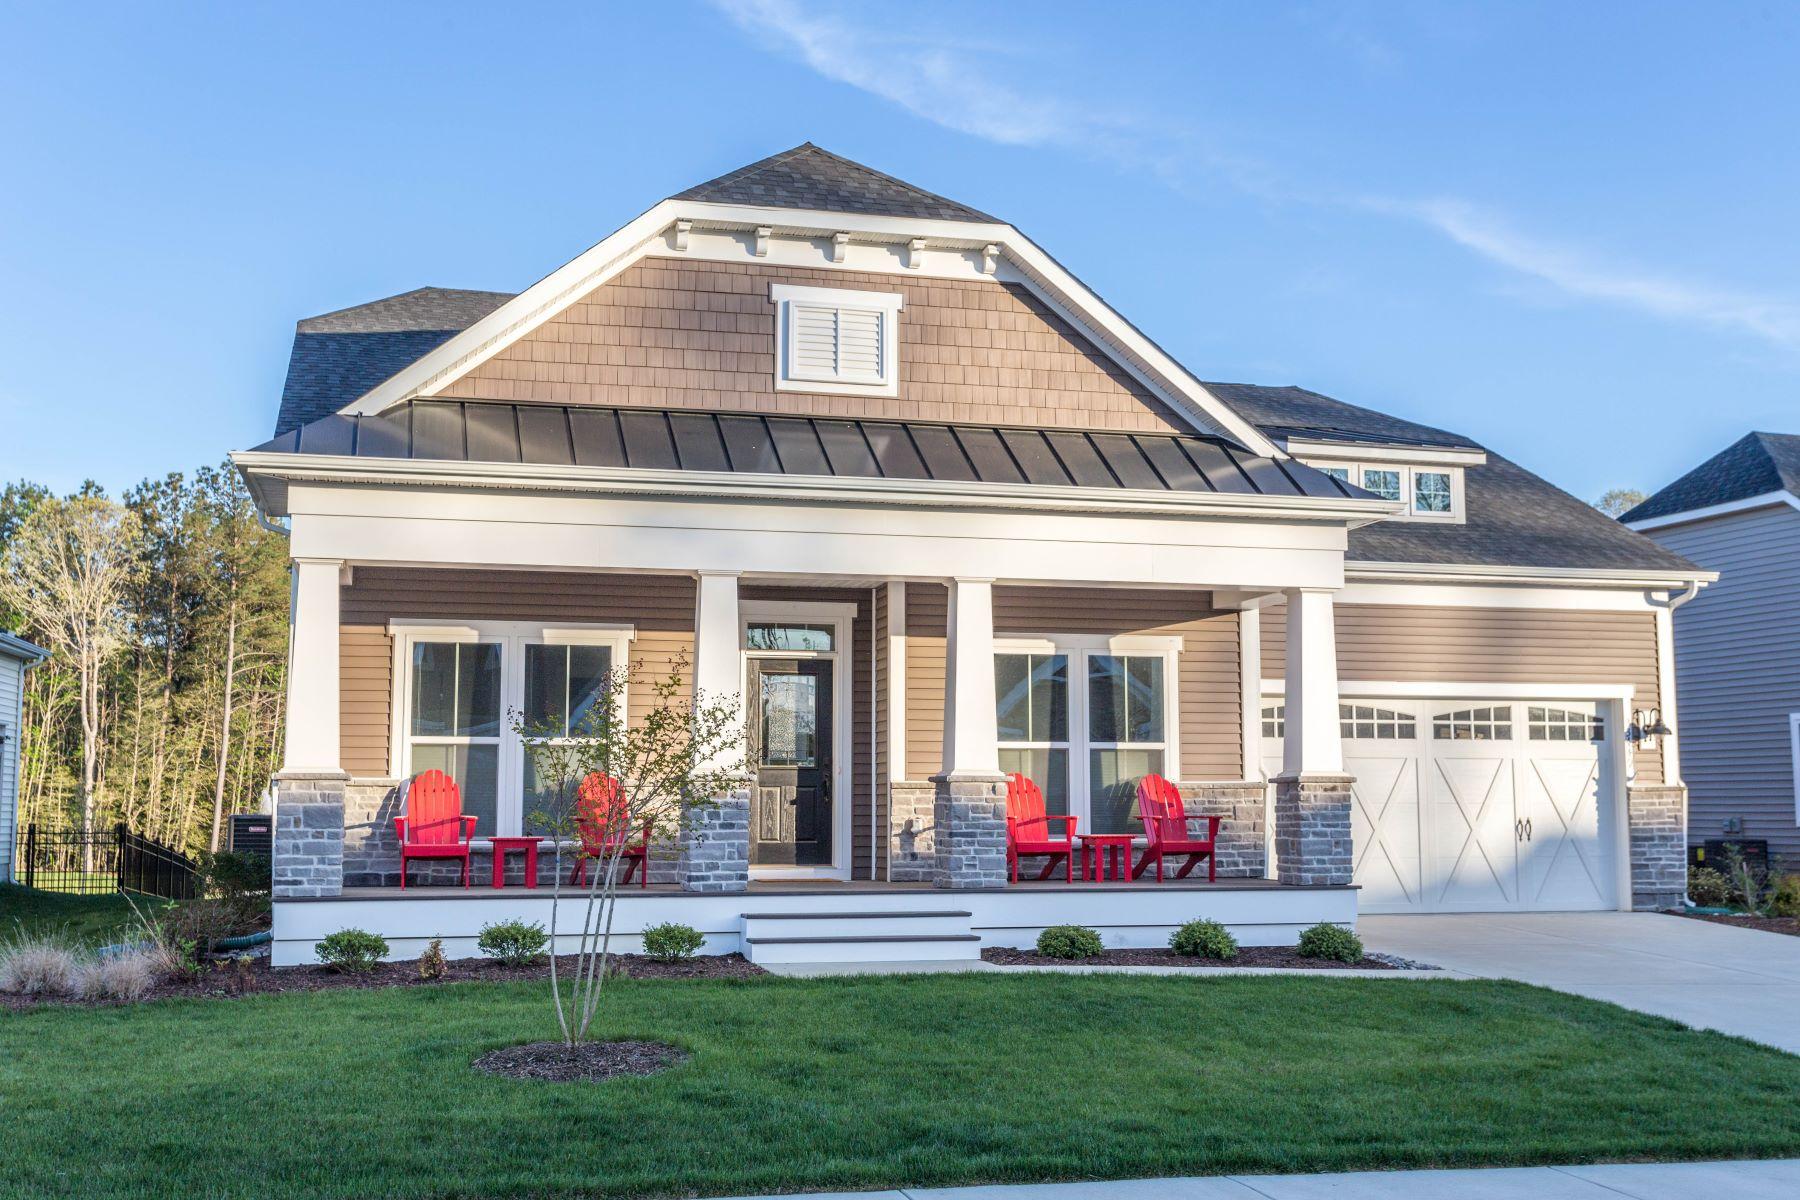 single family homes for Sale at 33449 Bridgehampton Ln , Lewes, DE 19958 33449 Bridgehampton Ln Lewes, Delaware 19958 United States